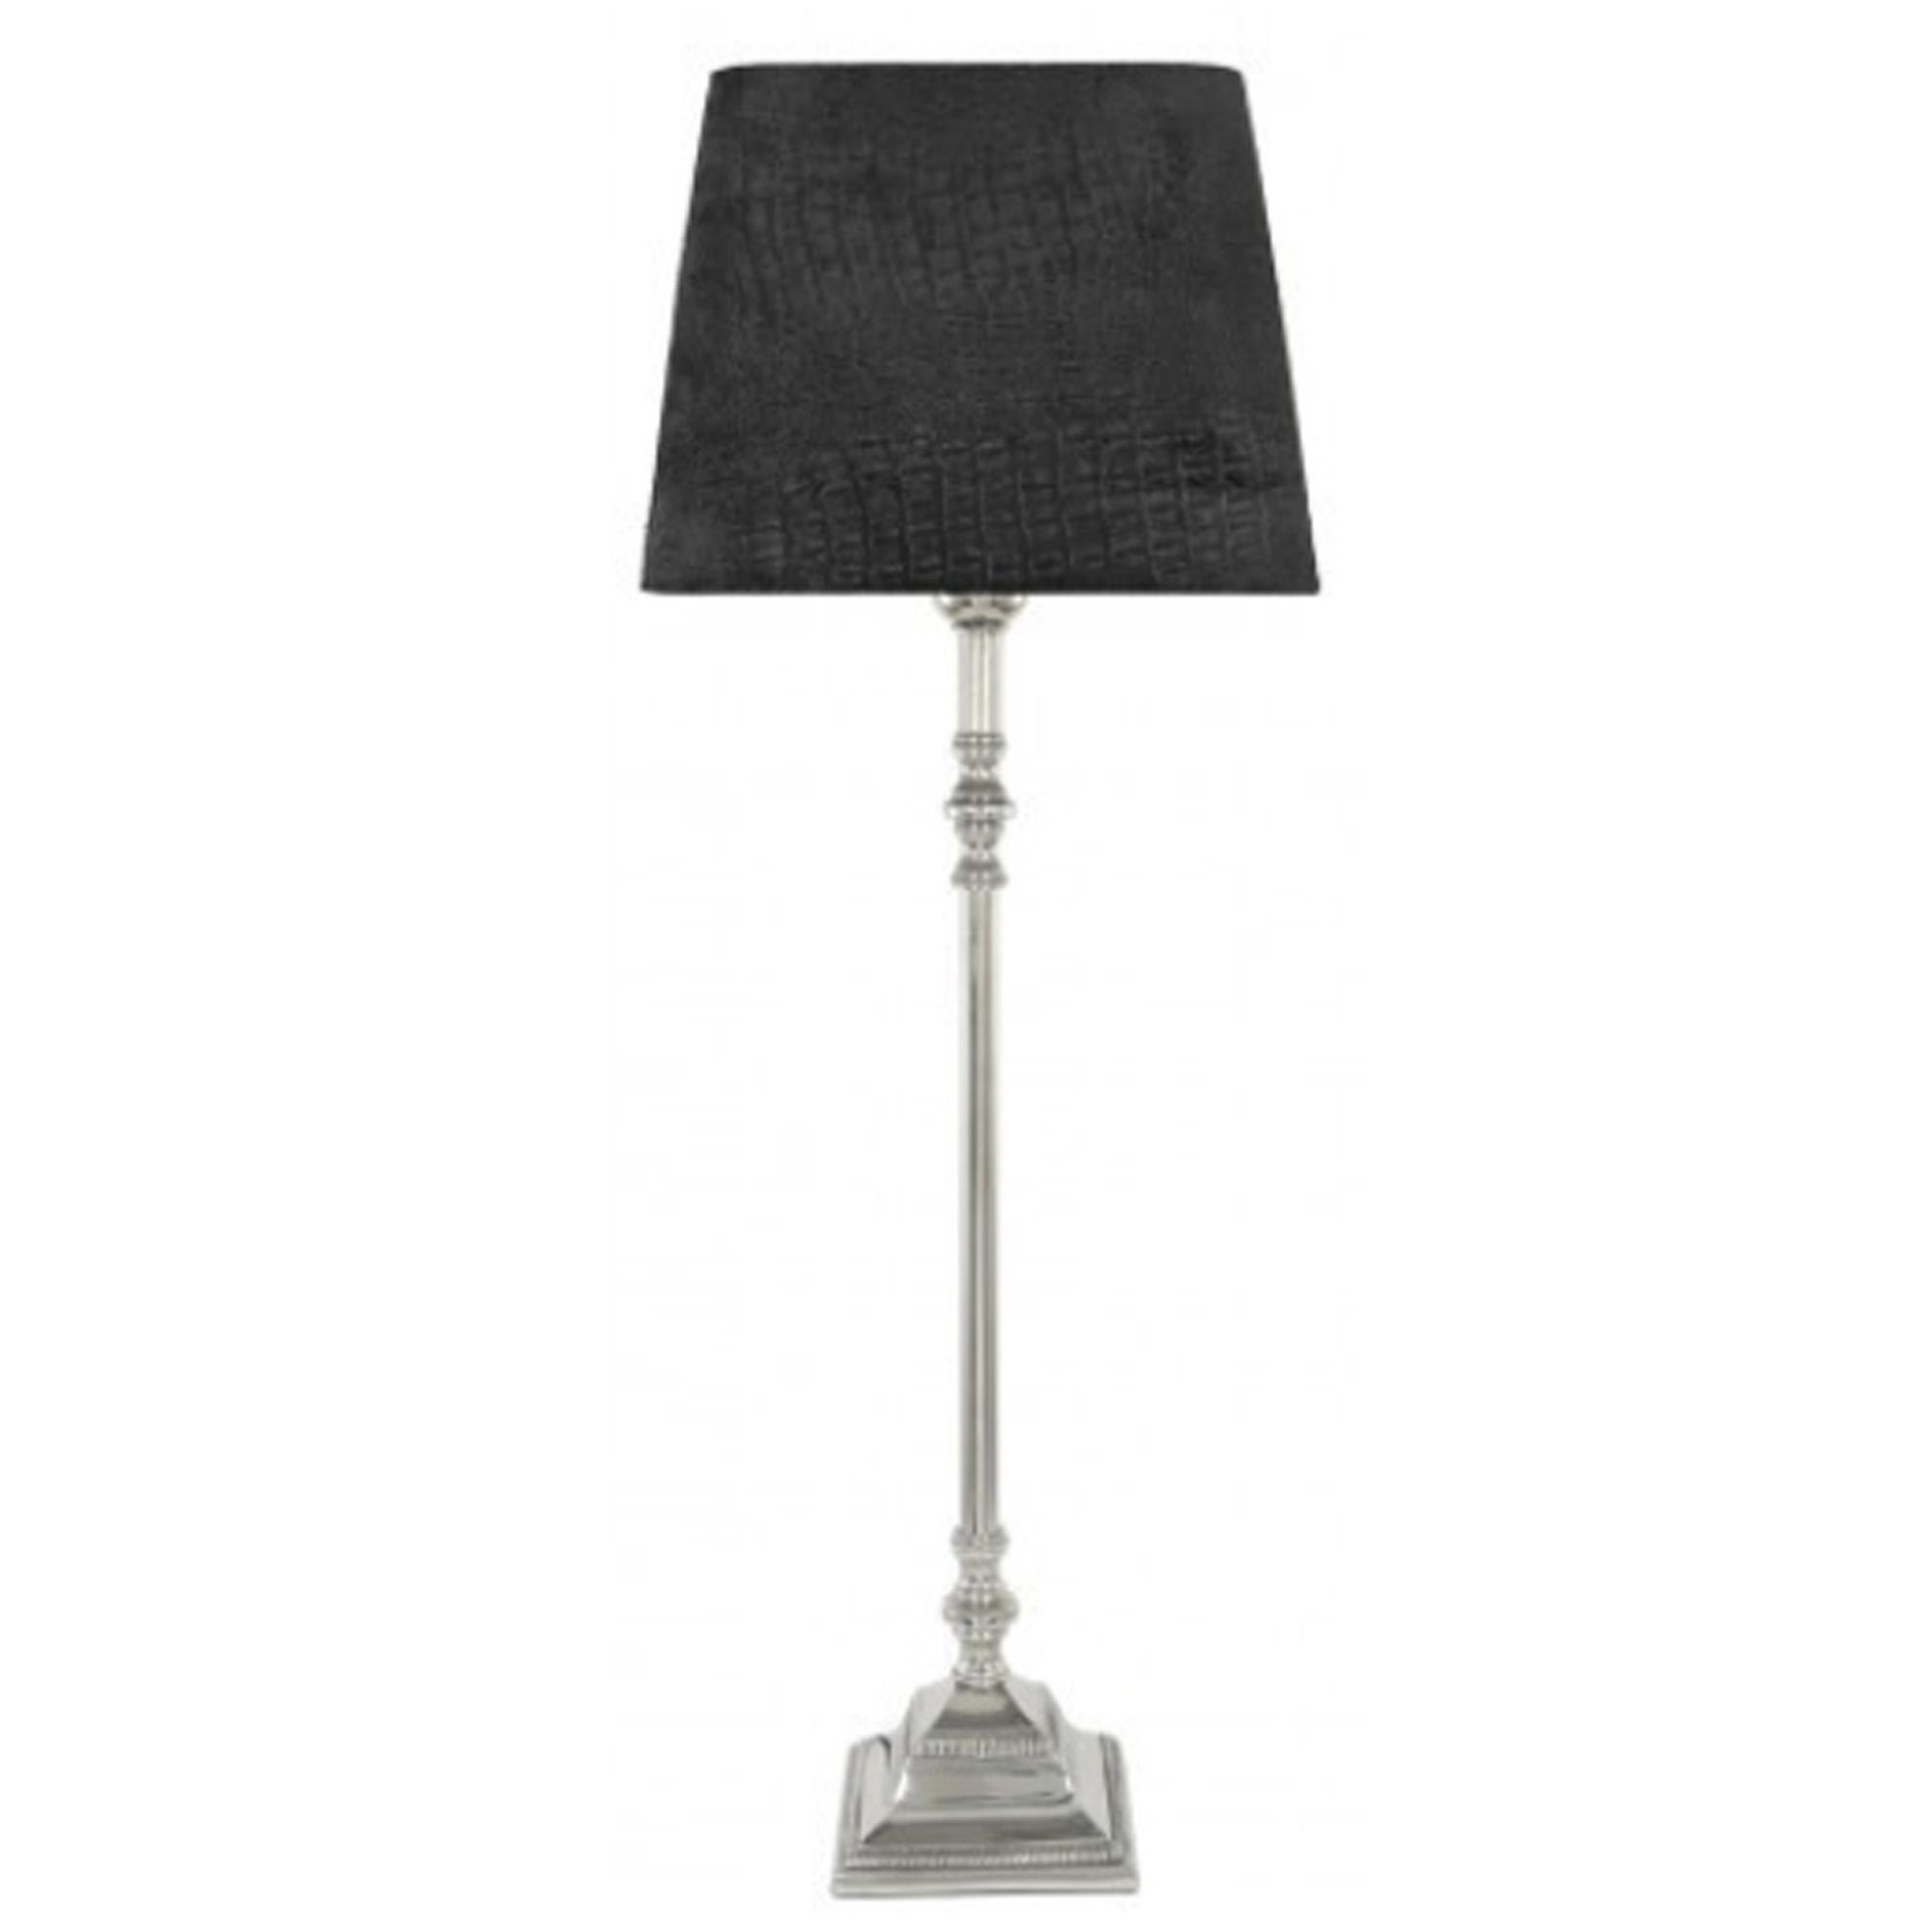 Modern Tall Tall Chrome Lamp Chrome Tall Table Modern Modern Lamp Table Chrome A45jq3LR